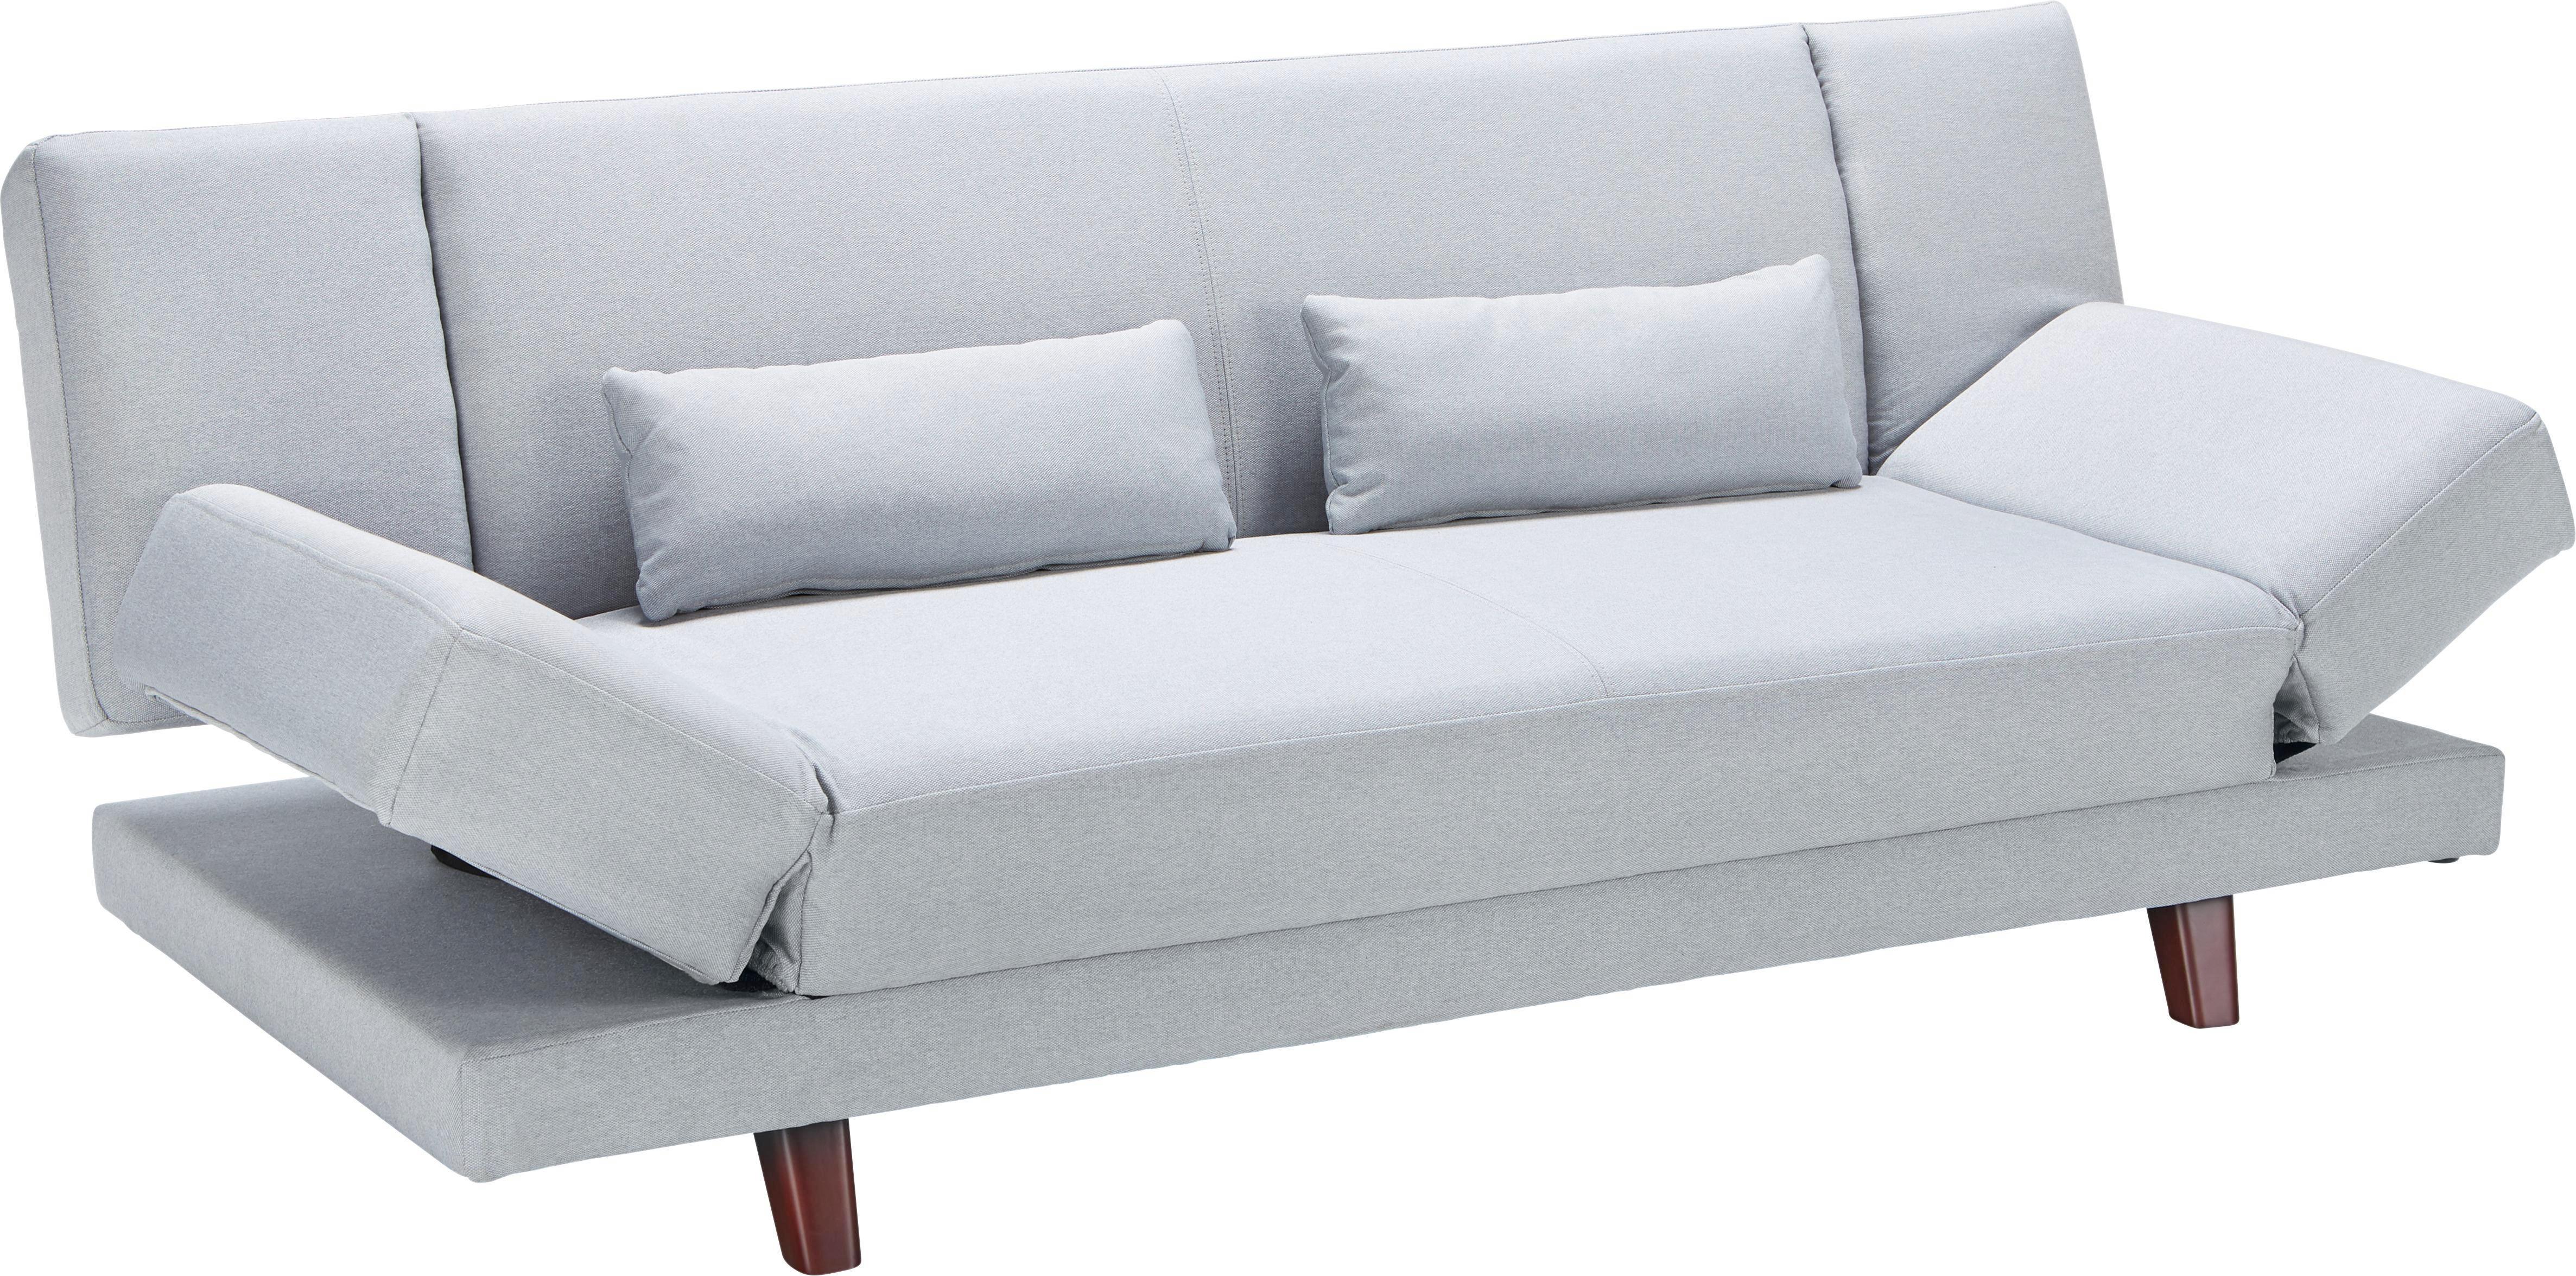 schlafsofa lngsschlfer 160 top sofa gebraucht hannover. Black Bedroom Furniture Sets. Home Design Ideas